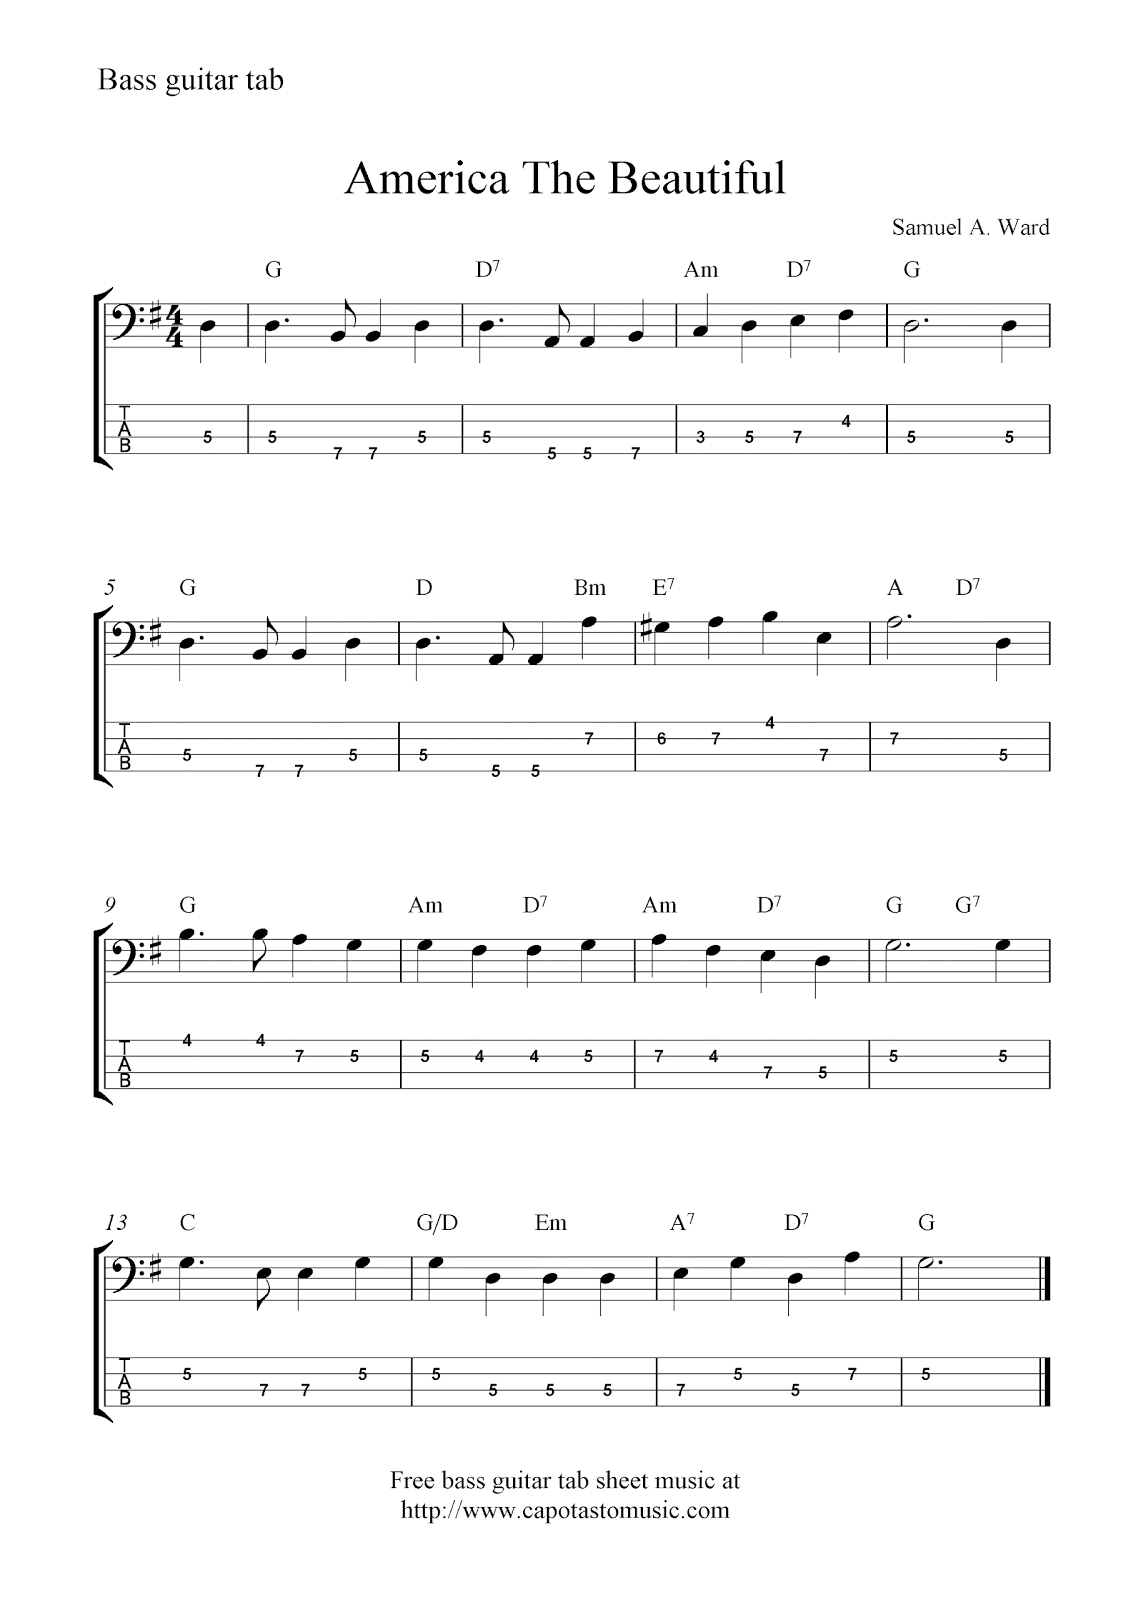 mmh mmh mmh chords